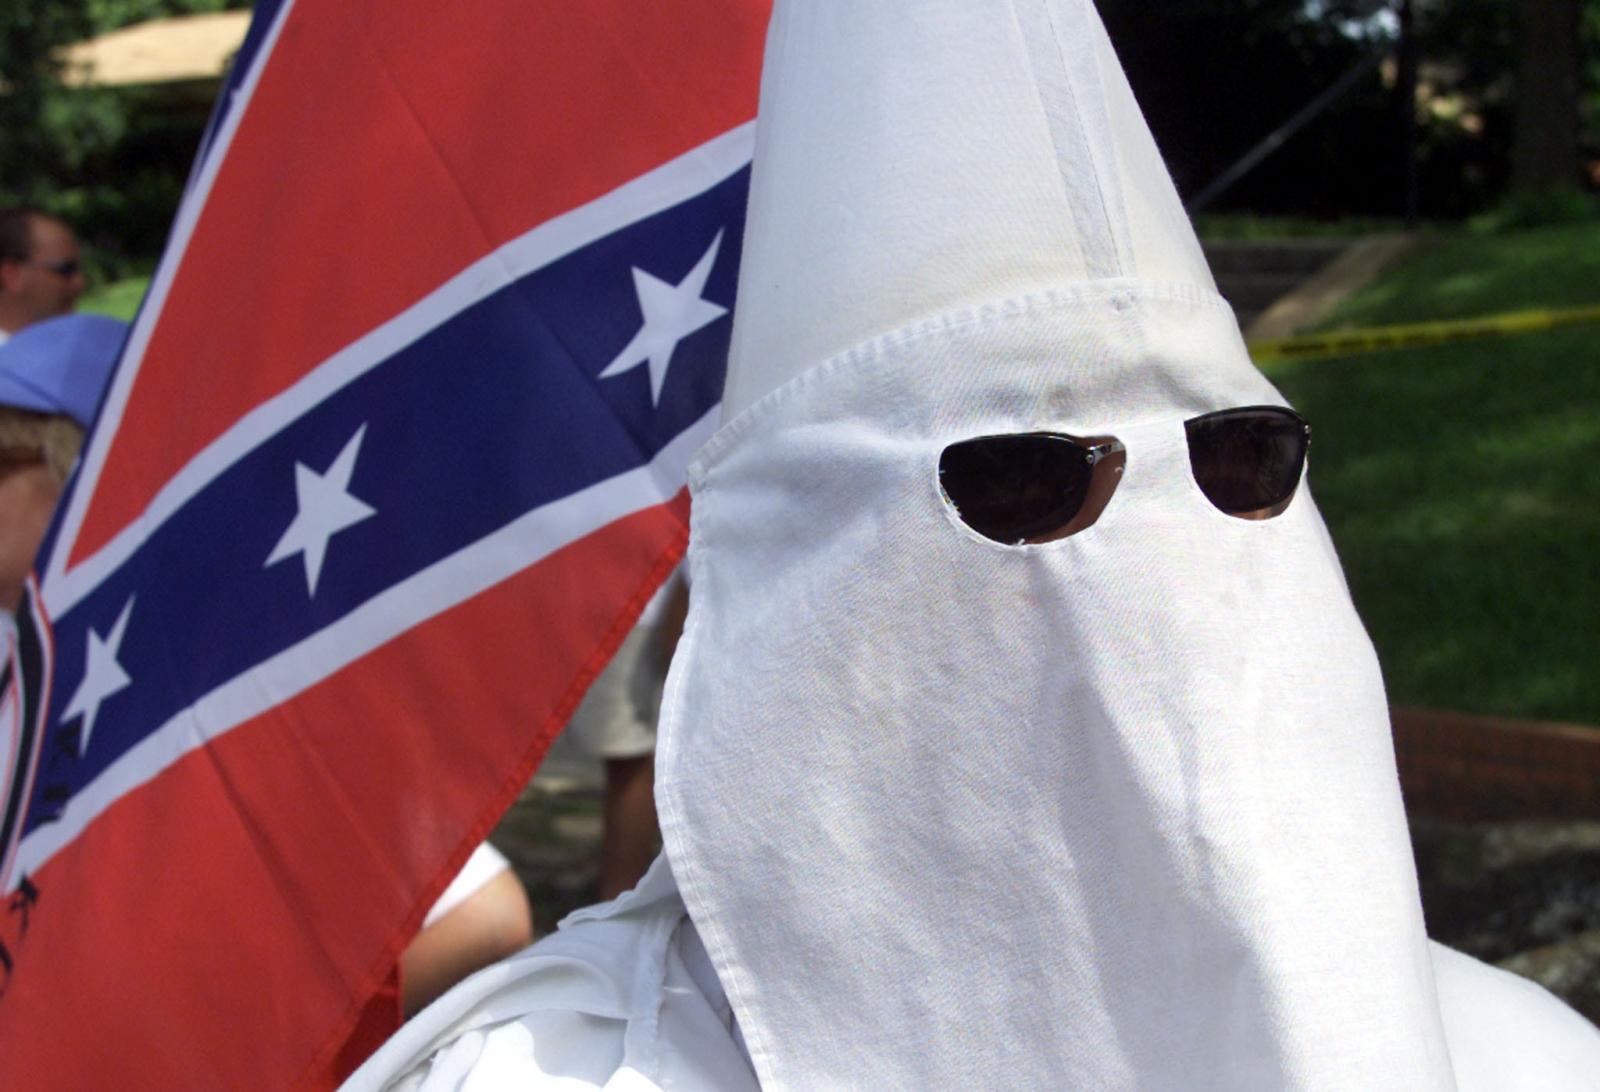 Ku Klux Klan member